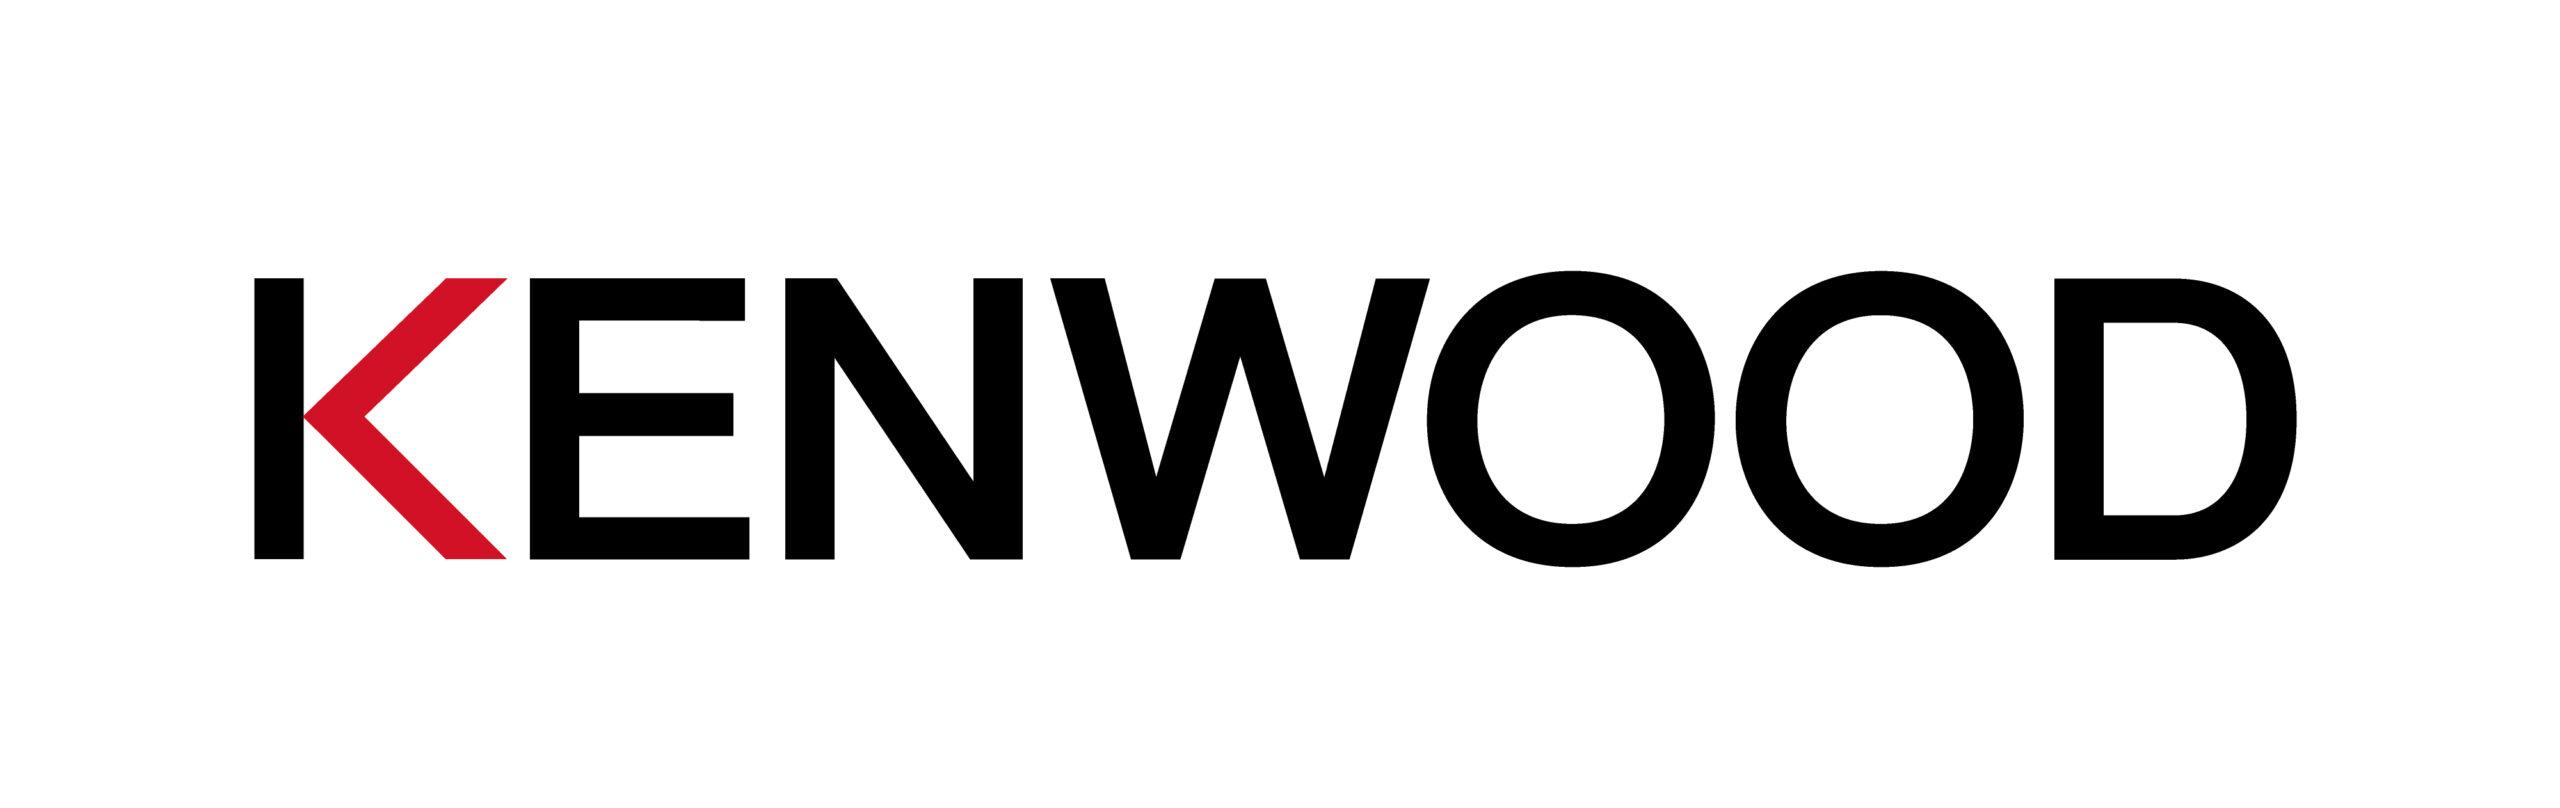 Kenwood_logo bez CM